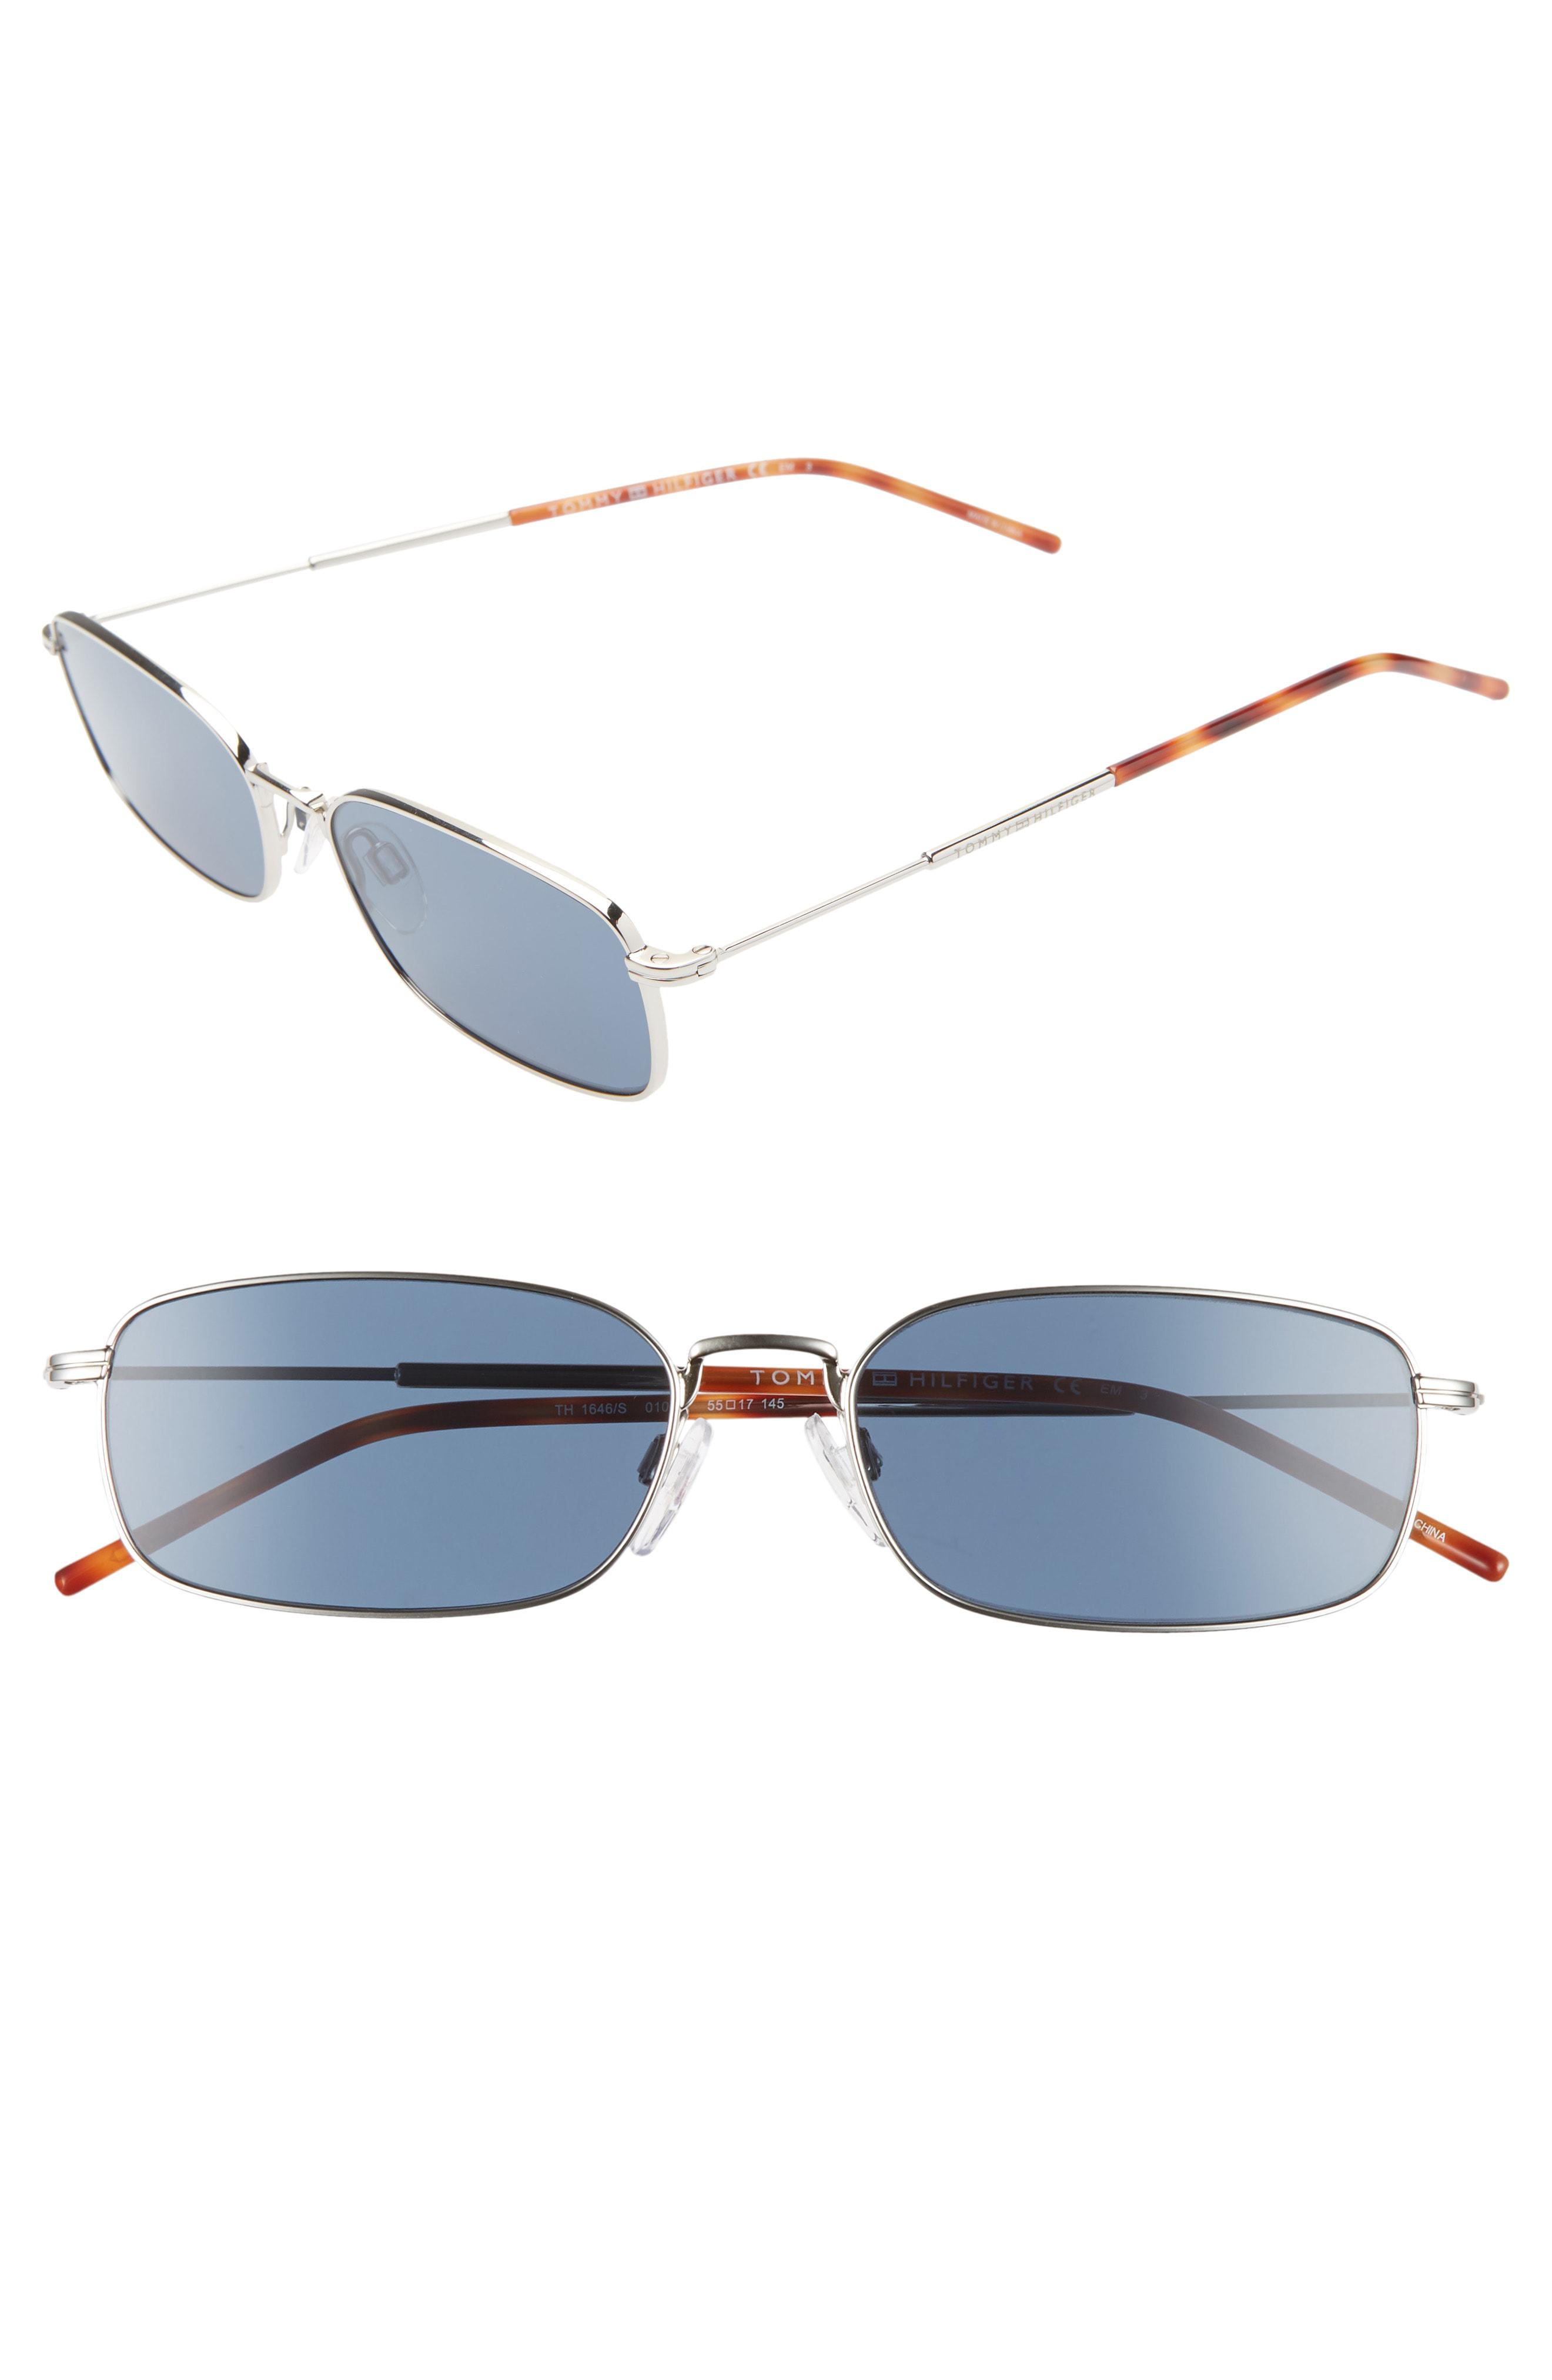 05ea046b2c8a Tommy Hilfiger 55Mm Rectangle Sunglasses - Palladium/ Blue | ModeSens